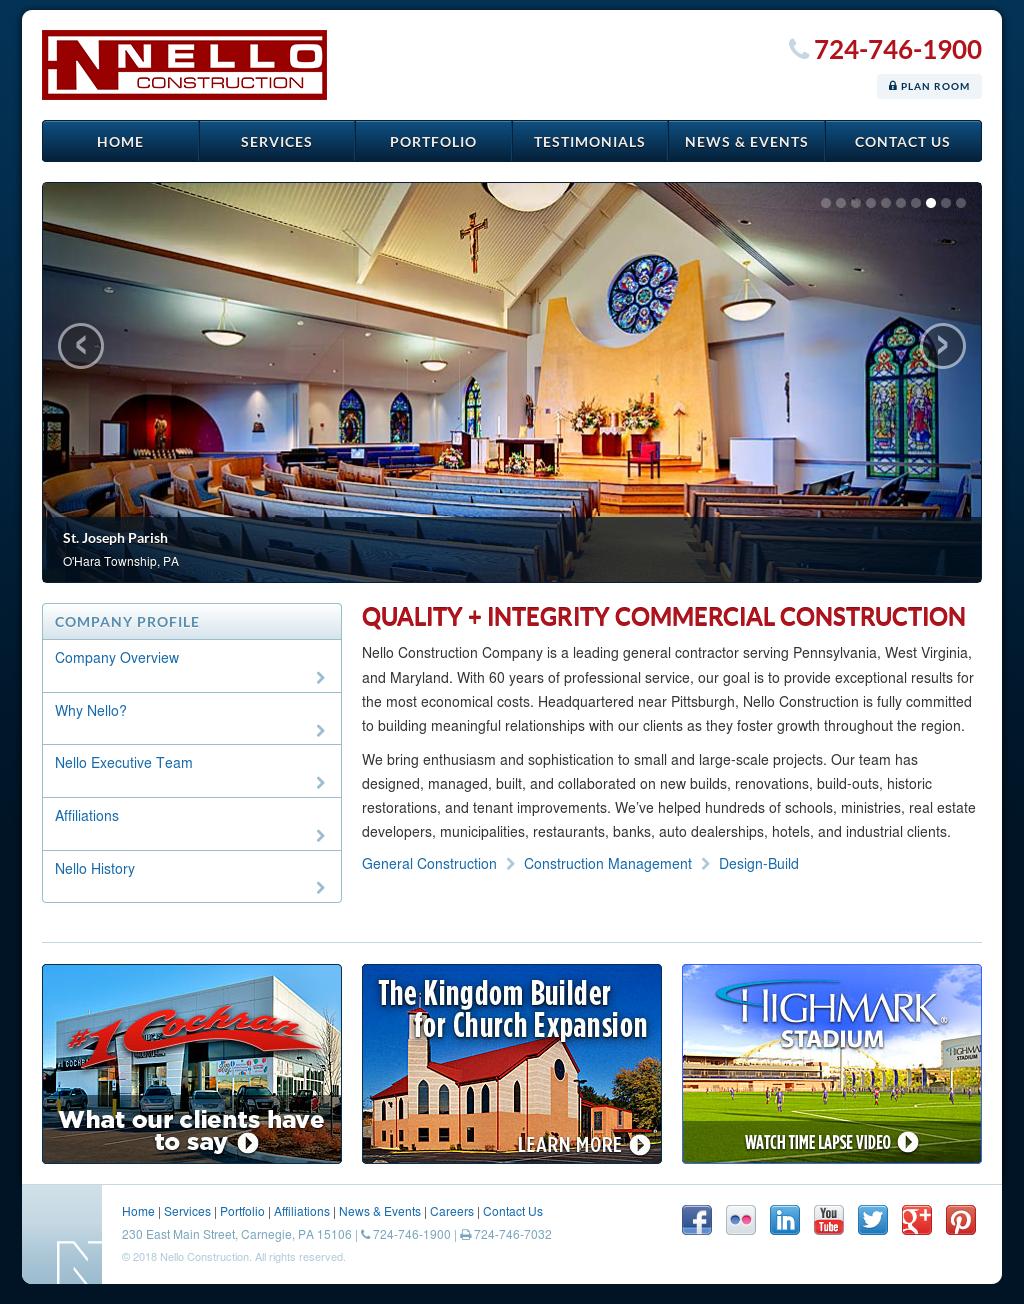 Nello Construction Competitors, Revenue and Employees - Owler